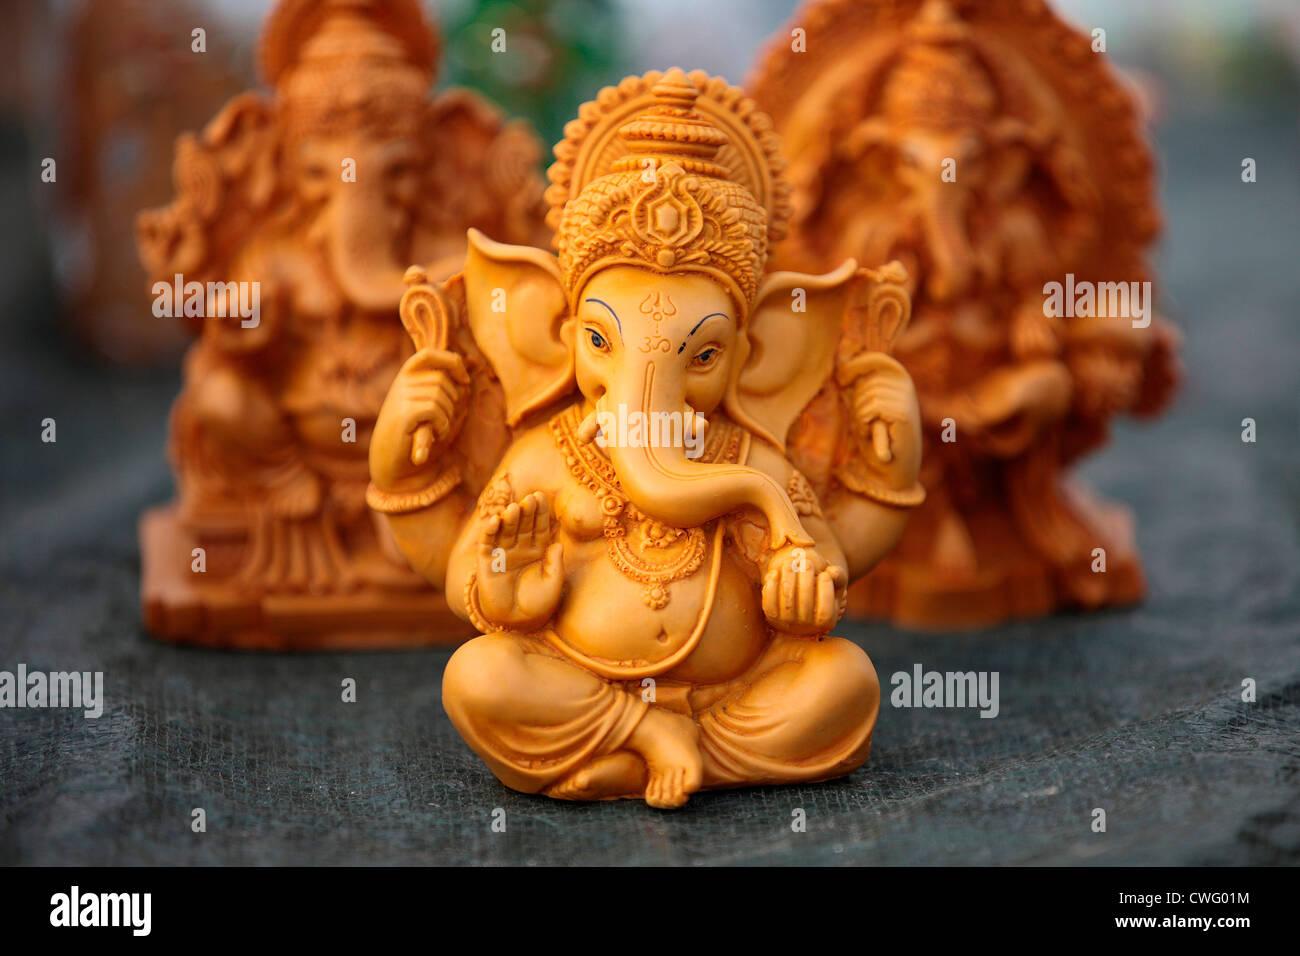 Clay God Ganesha Stock Photos & Clay God Ganesha Stock Images - Alamy